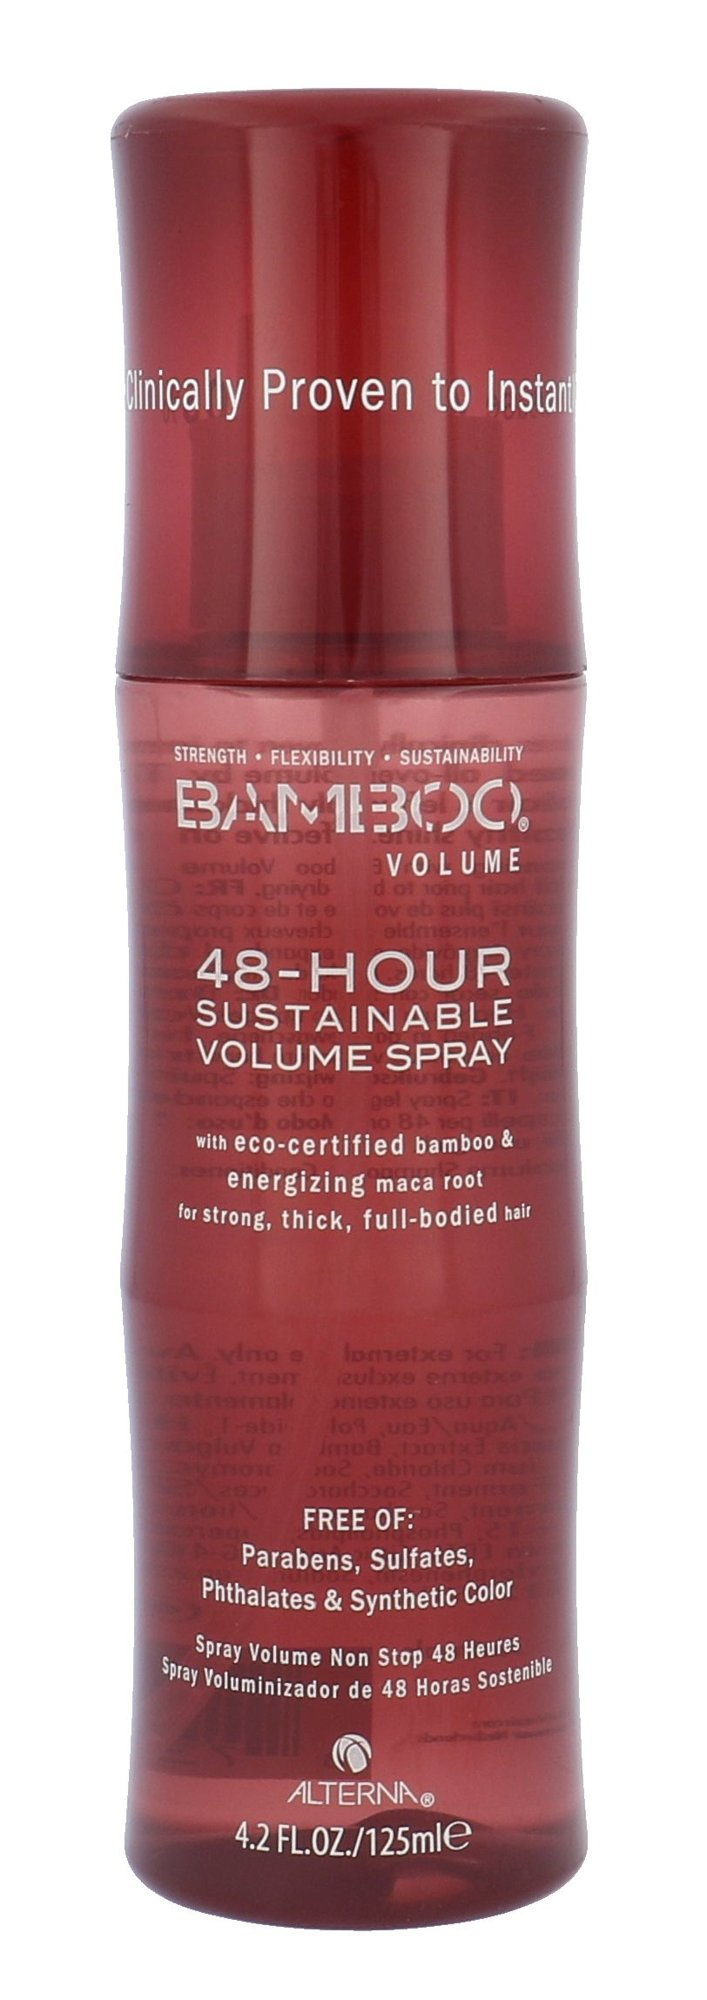 Alterna Bamboo Volume Cosmetic 125ml